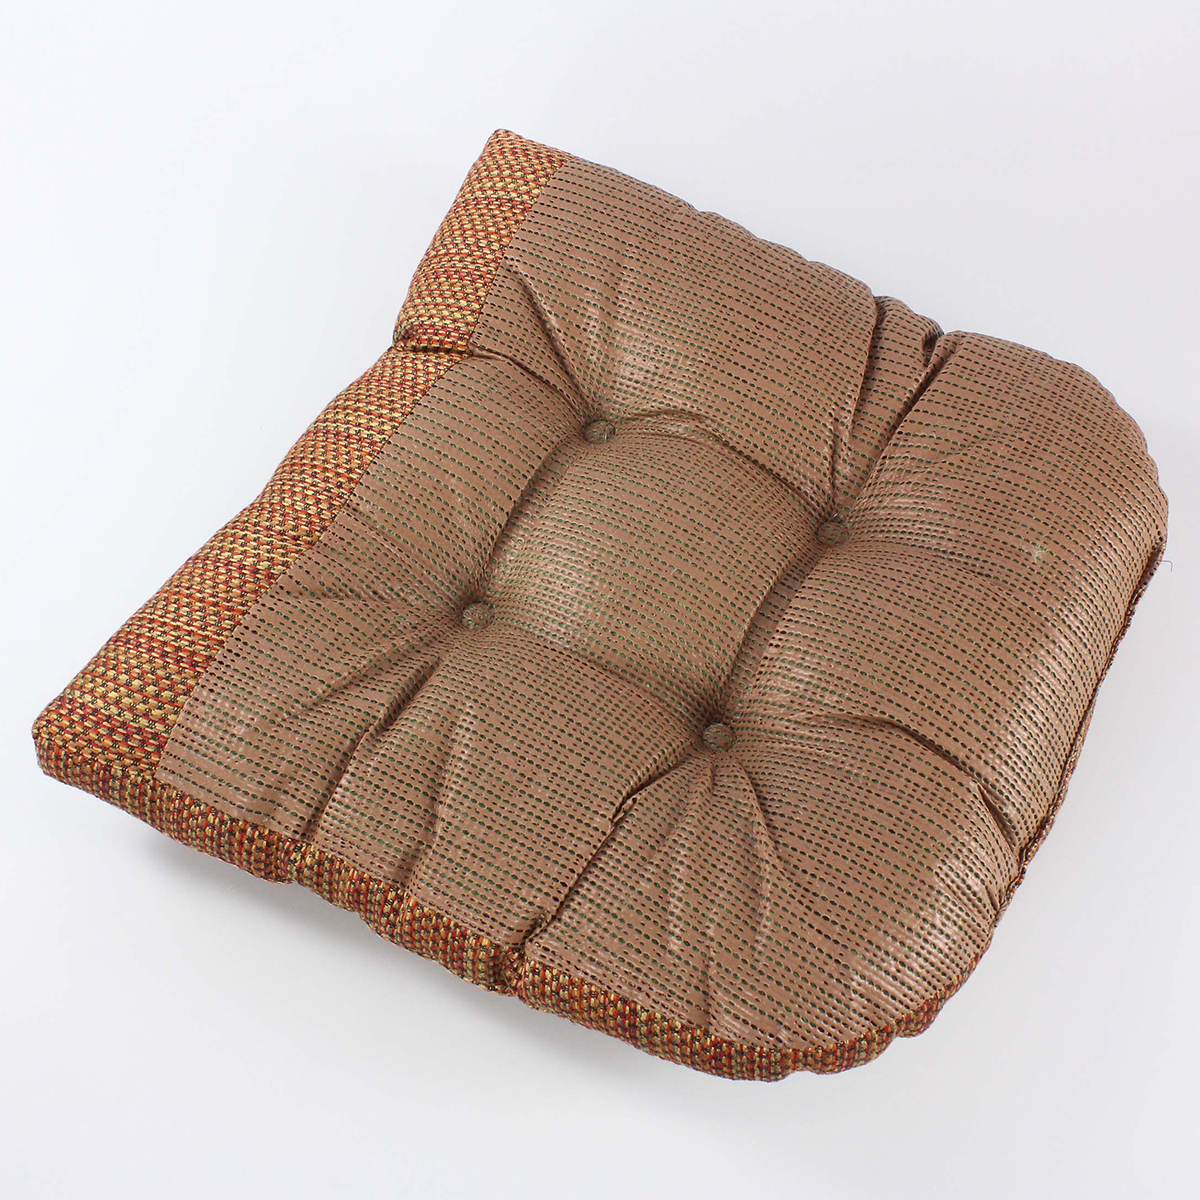 530007 XL Rocking Chair Cushion Set With Gripper Bottom